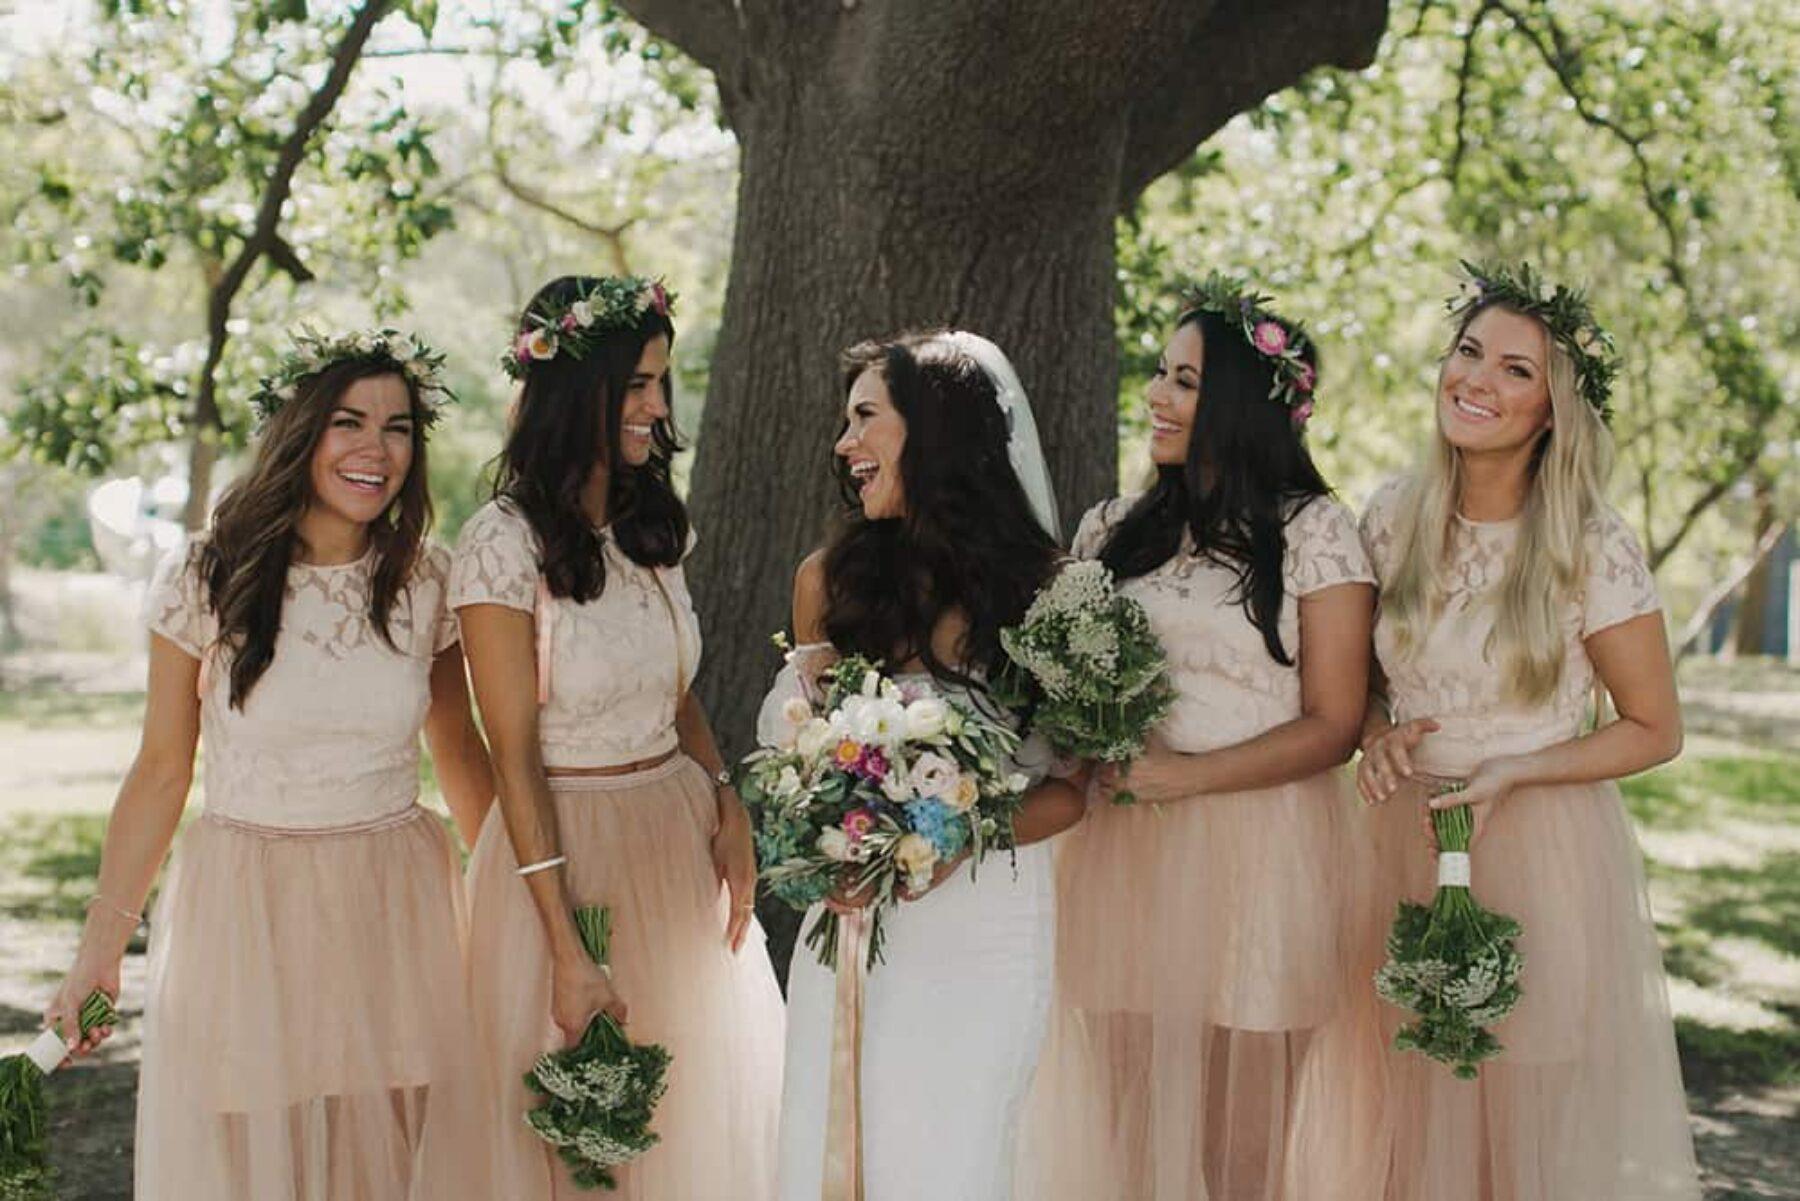 blush crop top bridesmaid dresses